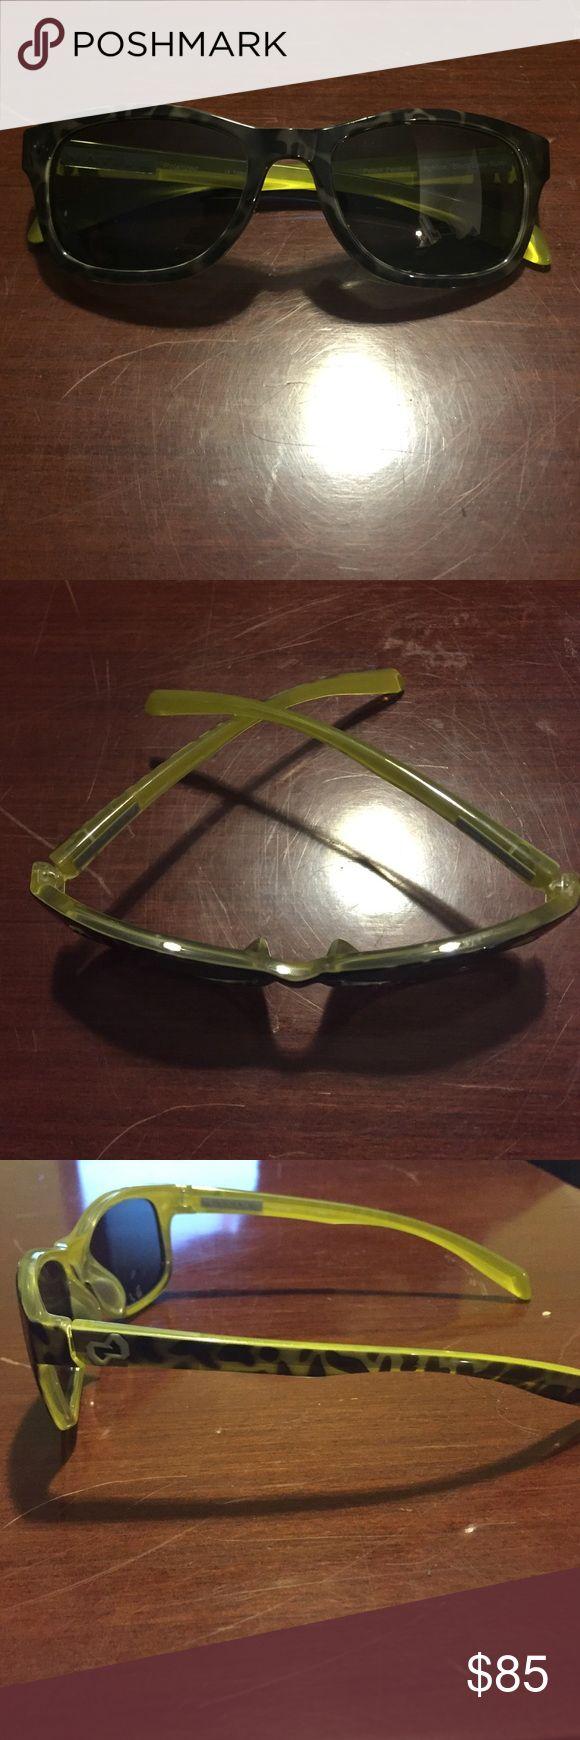 Native Eyewear Highline Polarized Sunglasses. Native Eyewear Highline Polarized Sunglasses. Color is Black Lime Burst. Never worn. Native Accessories Sunglasses